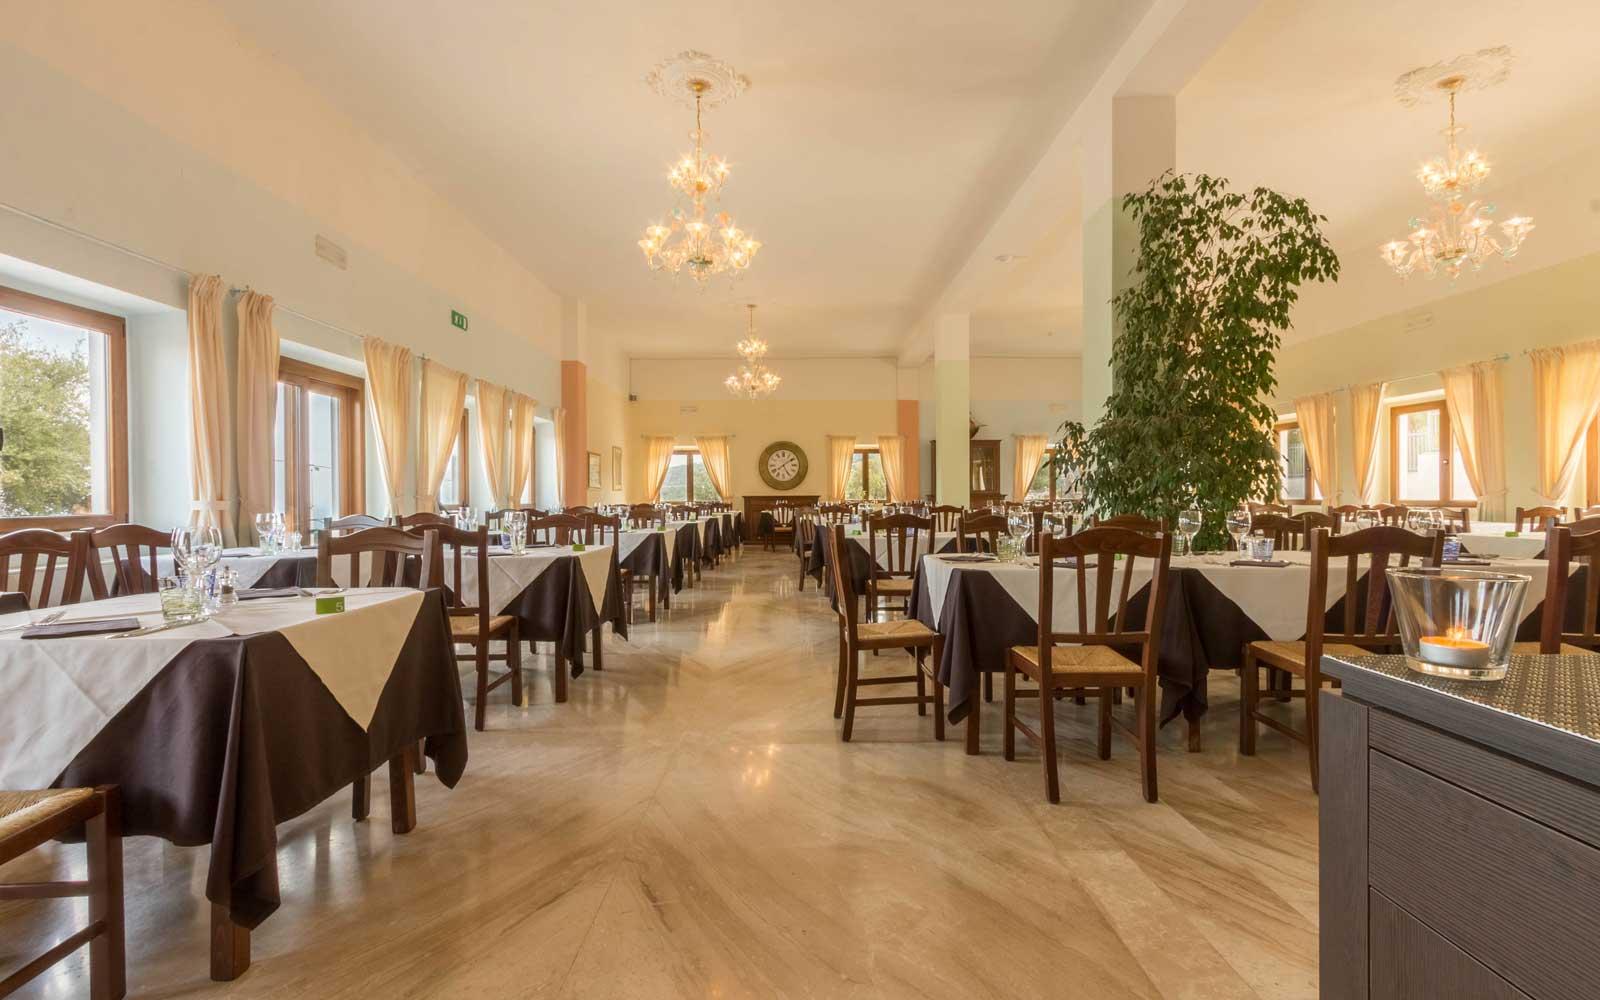 Sala Restaurant at Hotel Brancamaria